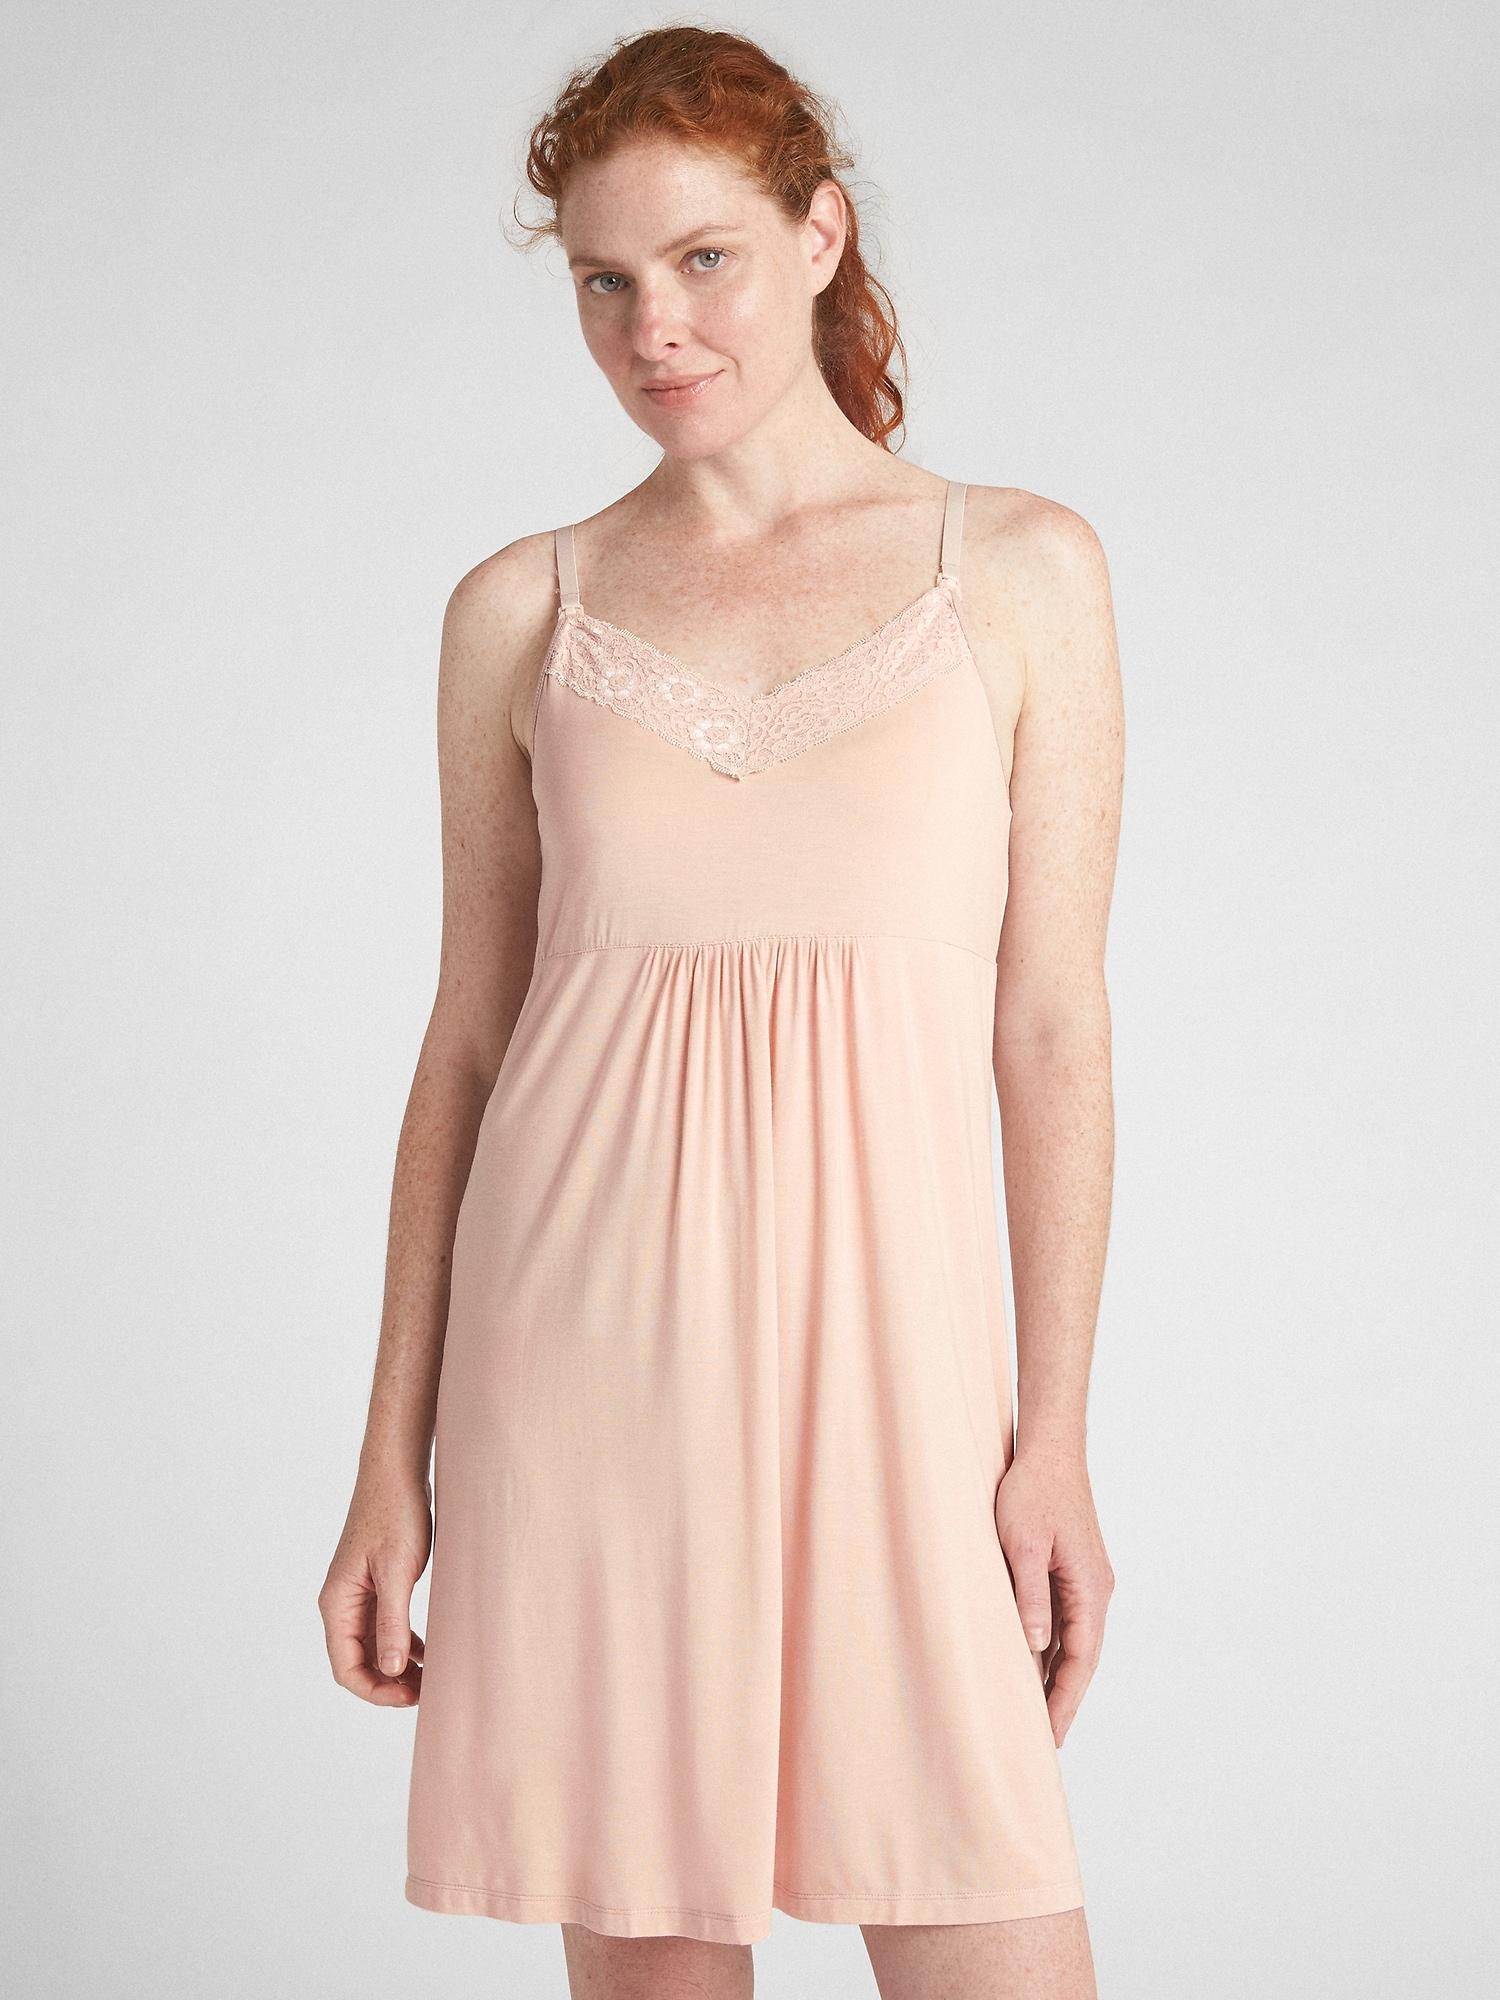 f81d5dd2e12d3 Maternity nursing nightgown